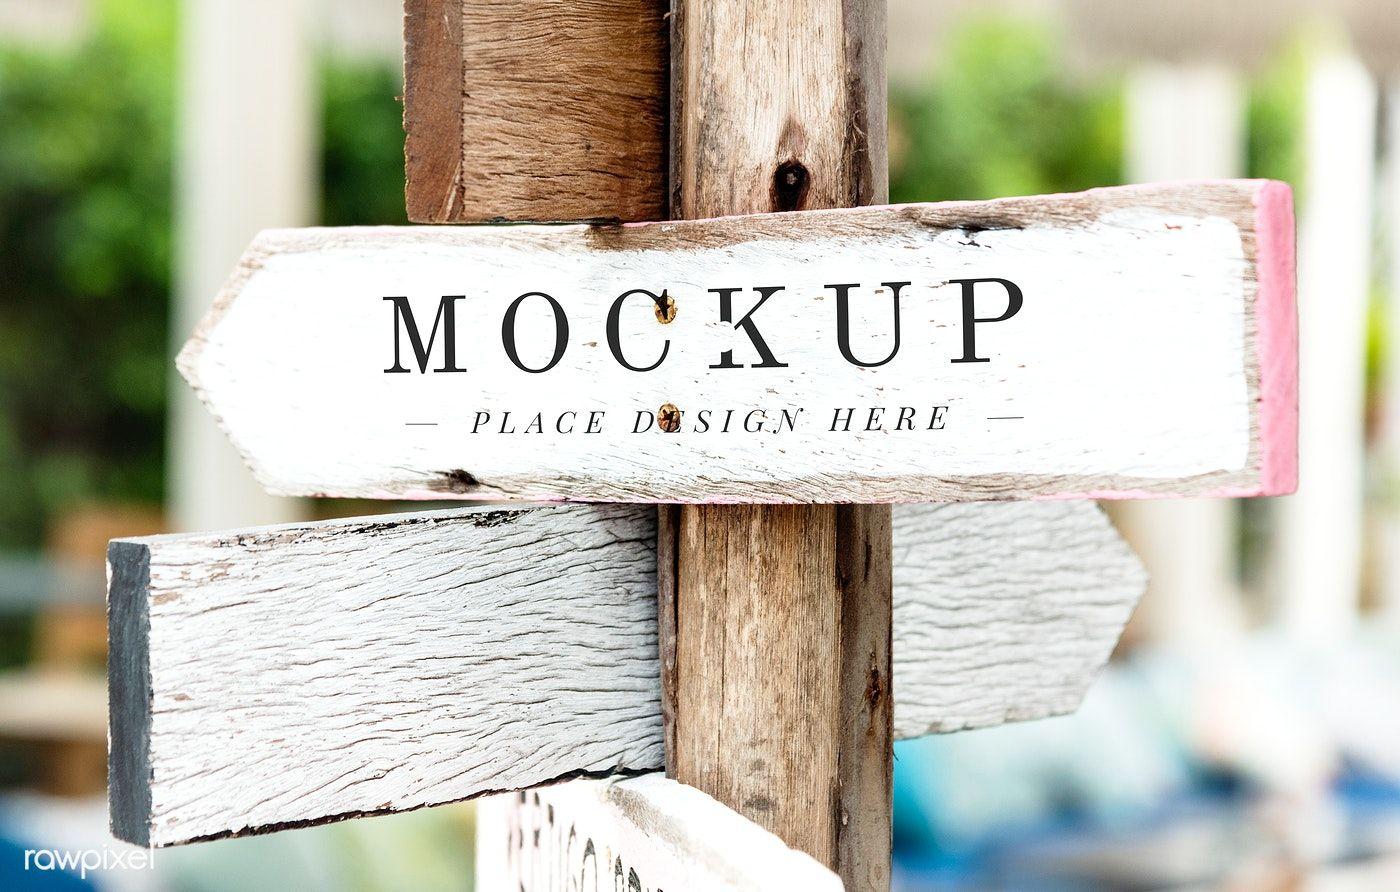 Freemockup Mockup Graphicsdesign Wooden Signage Wooden Street Arrow Signs